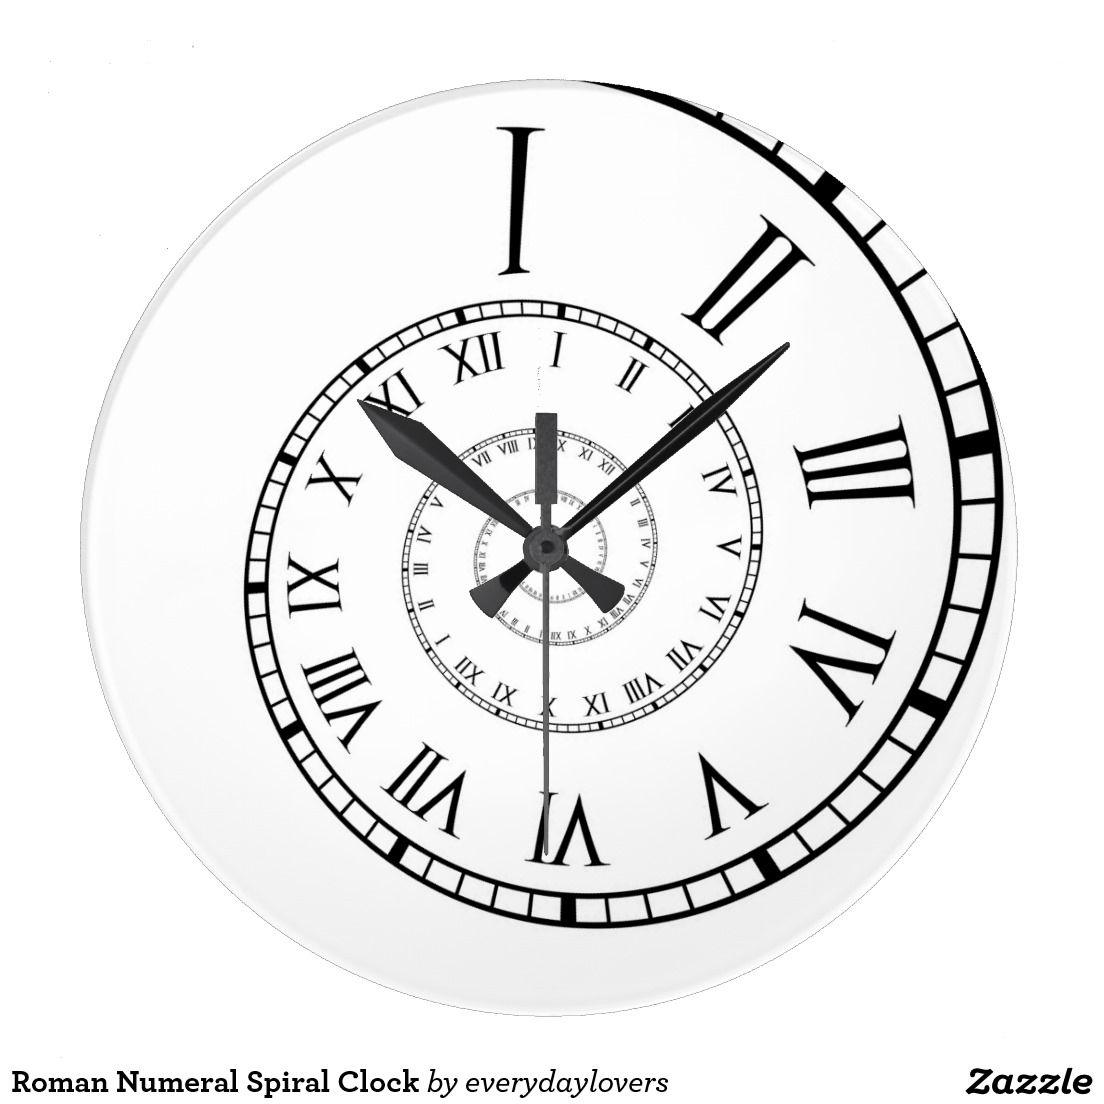 Roman Numeral Spiral Clock